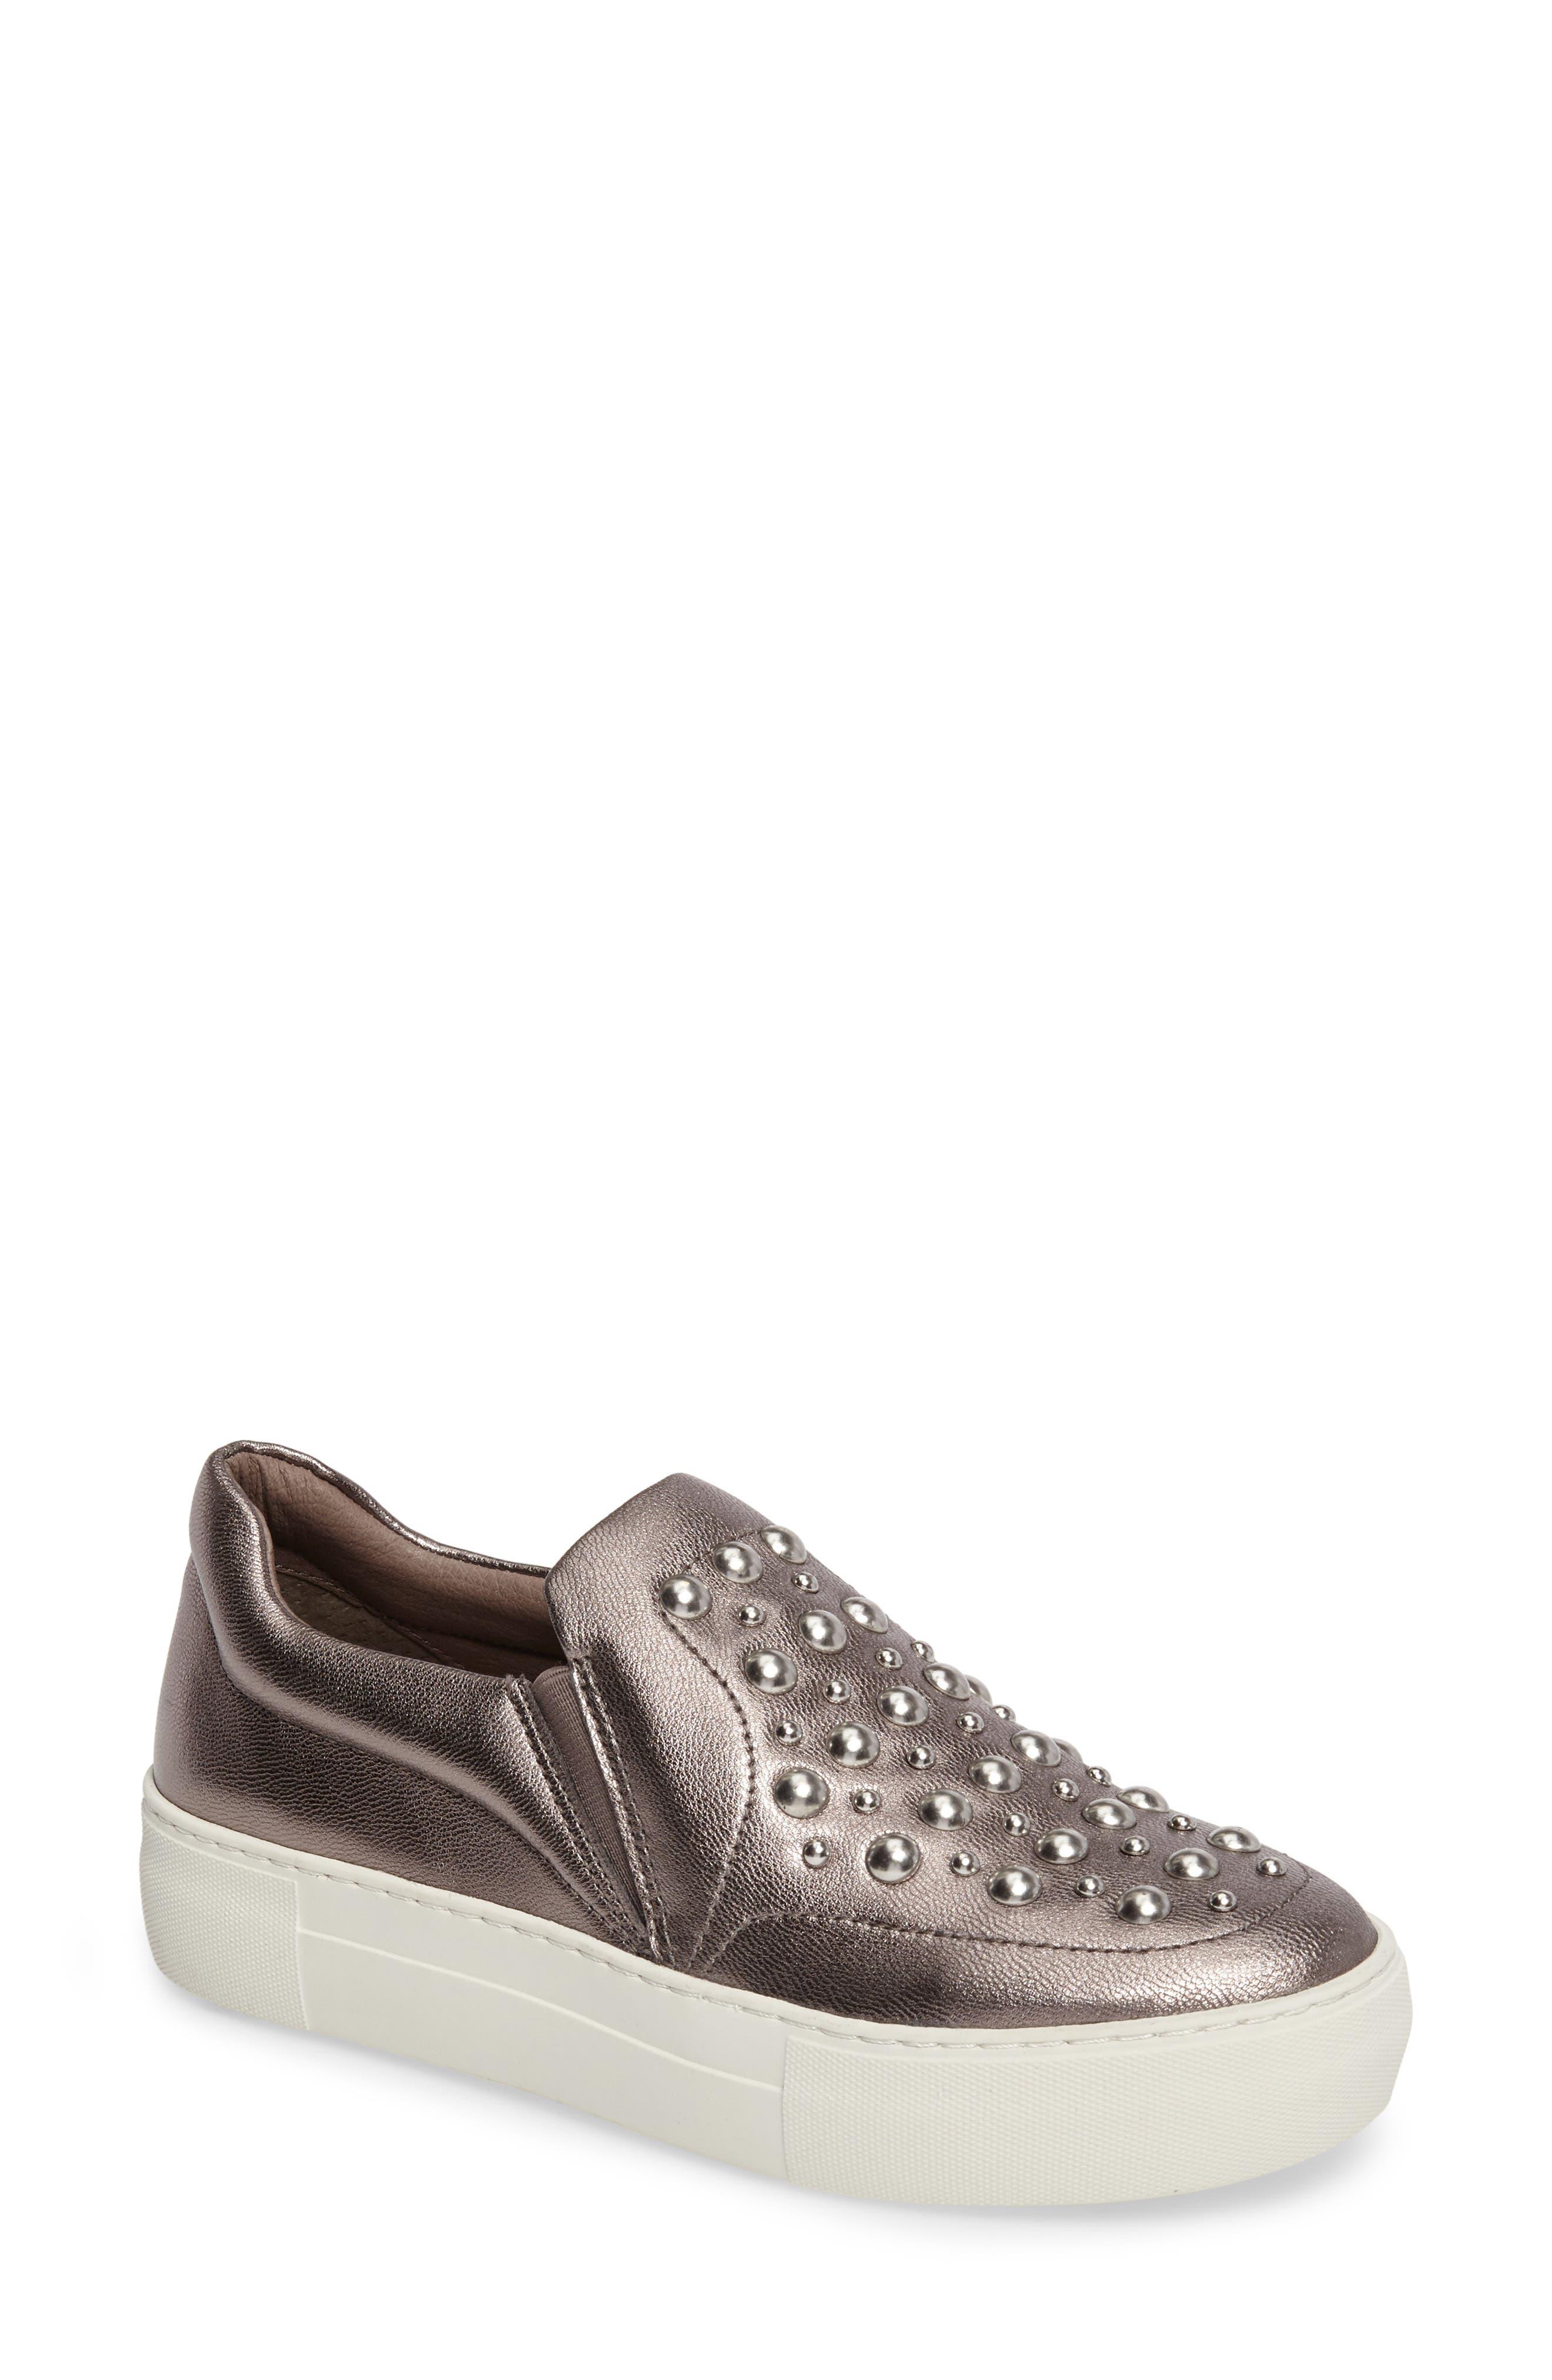 Atom Slip-On Platform Sneaker,                             Main thumbnail 1, color,                             Pewter Leather